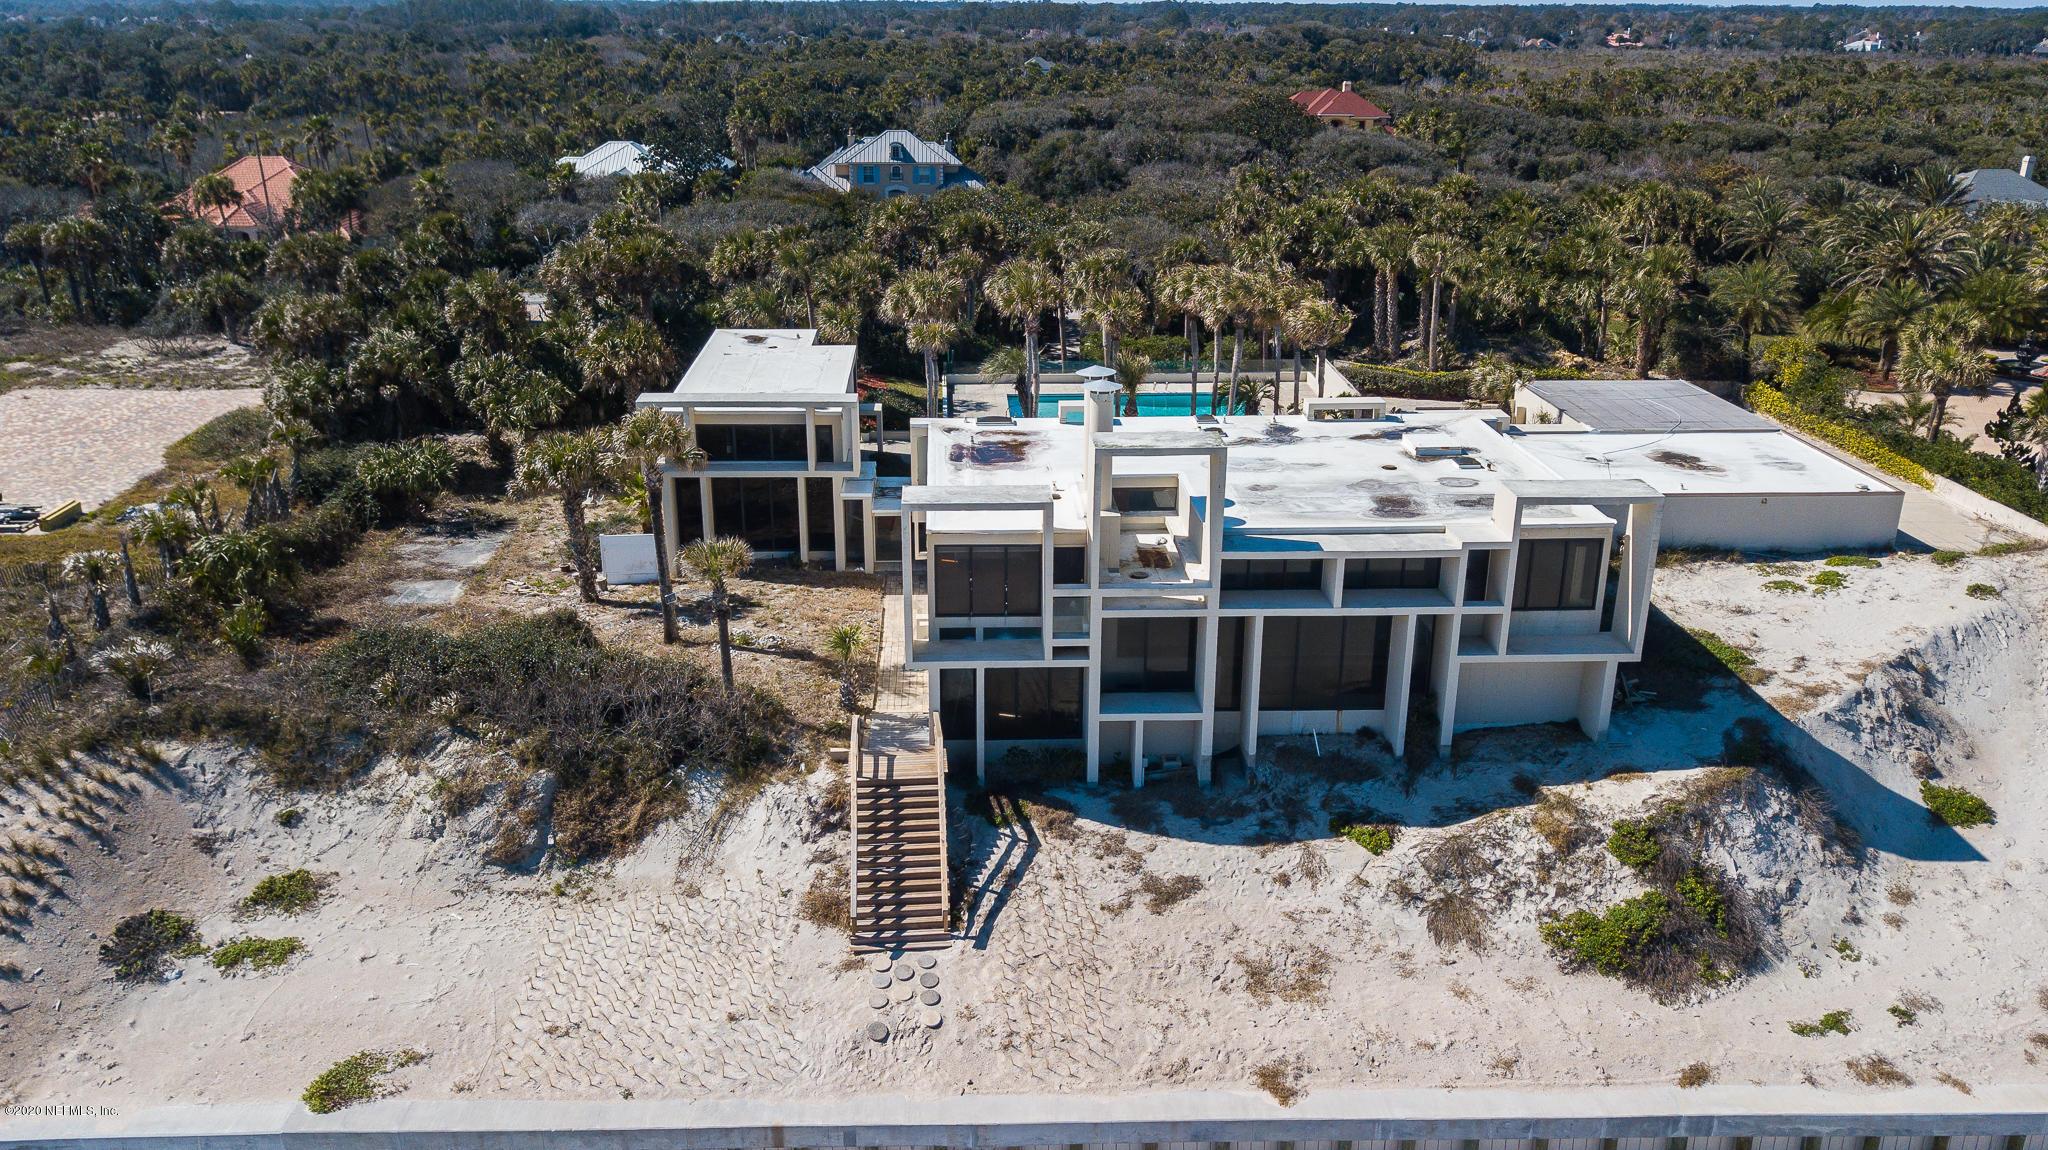 1033 PONTE VEDRA, PONTE VEDRA BEACH, FLORIDA 32082, 5 Bedrooms Bedrooms, ,5 BathroomsBathrooms,Residential,For sale,PONTE VEDRA,1037988